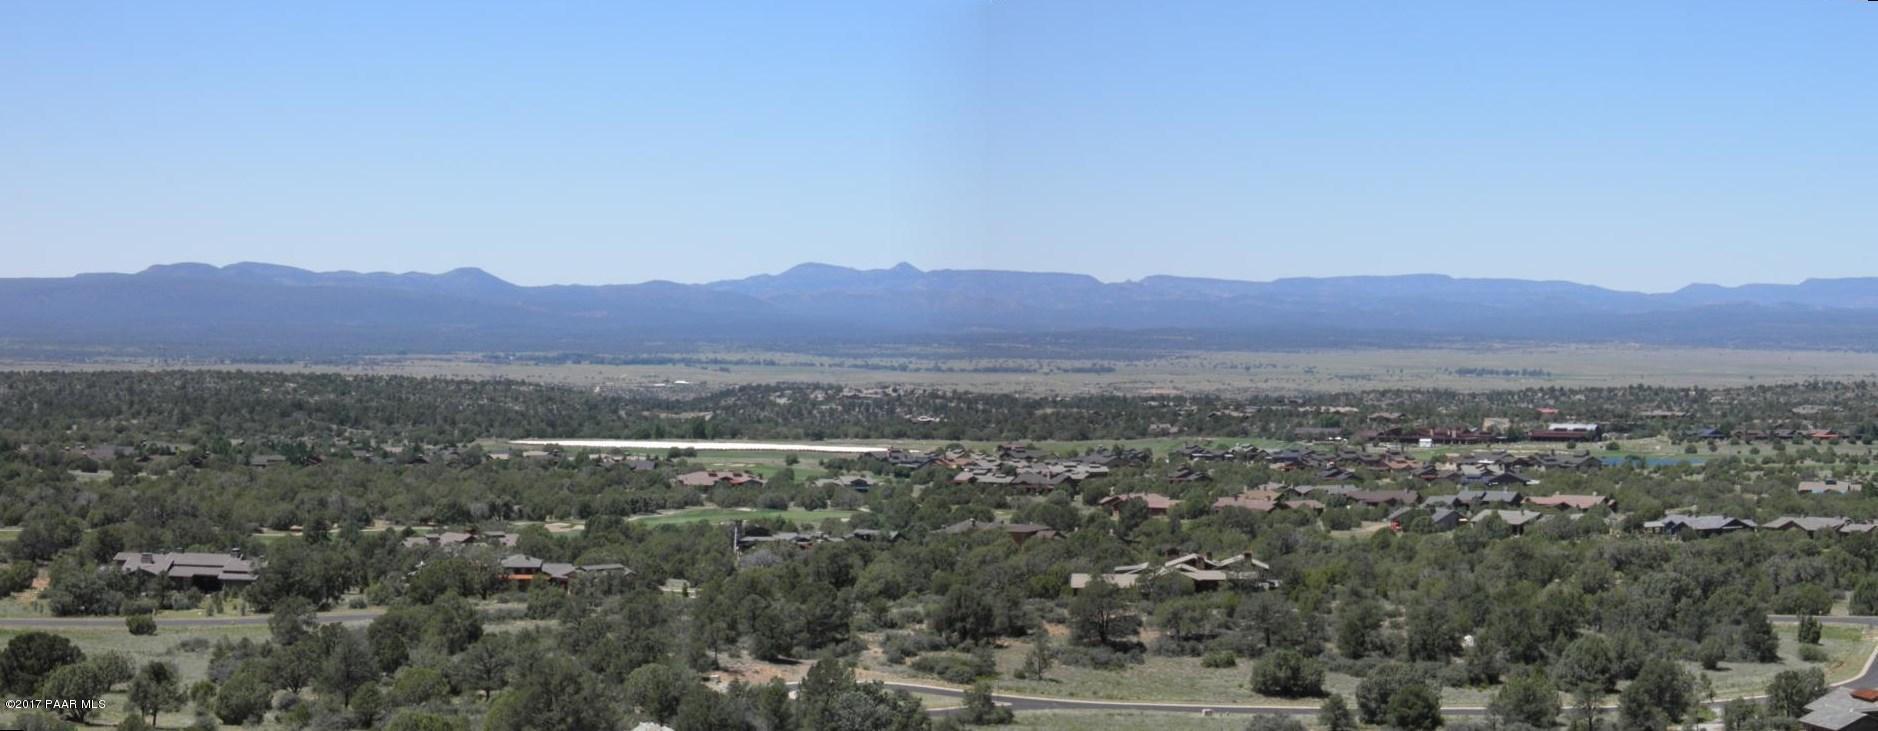 0000 N Adobe Trail # 0, Prescott, AZ, 86305 Primary Photo